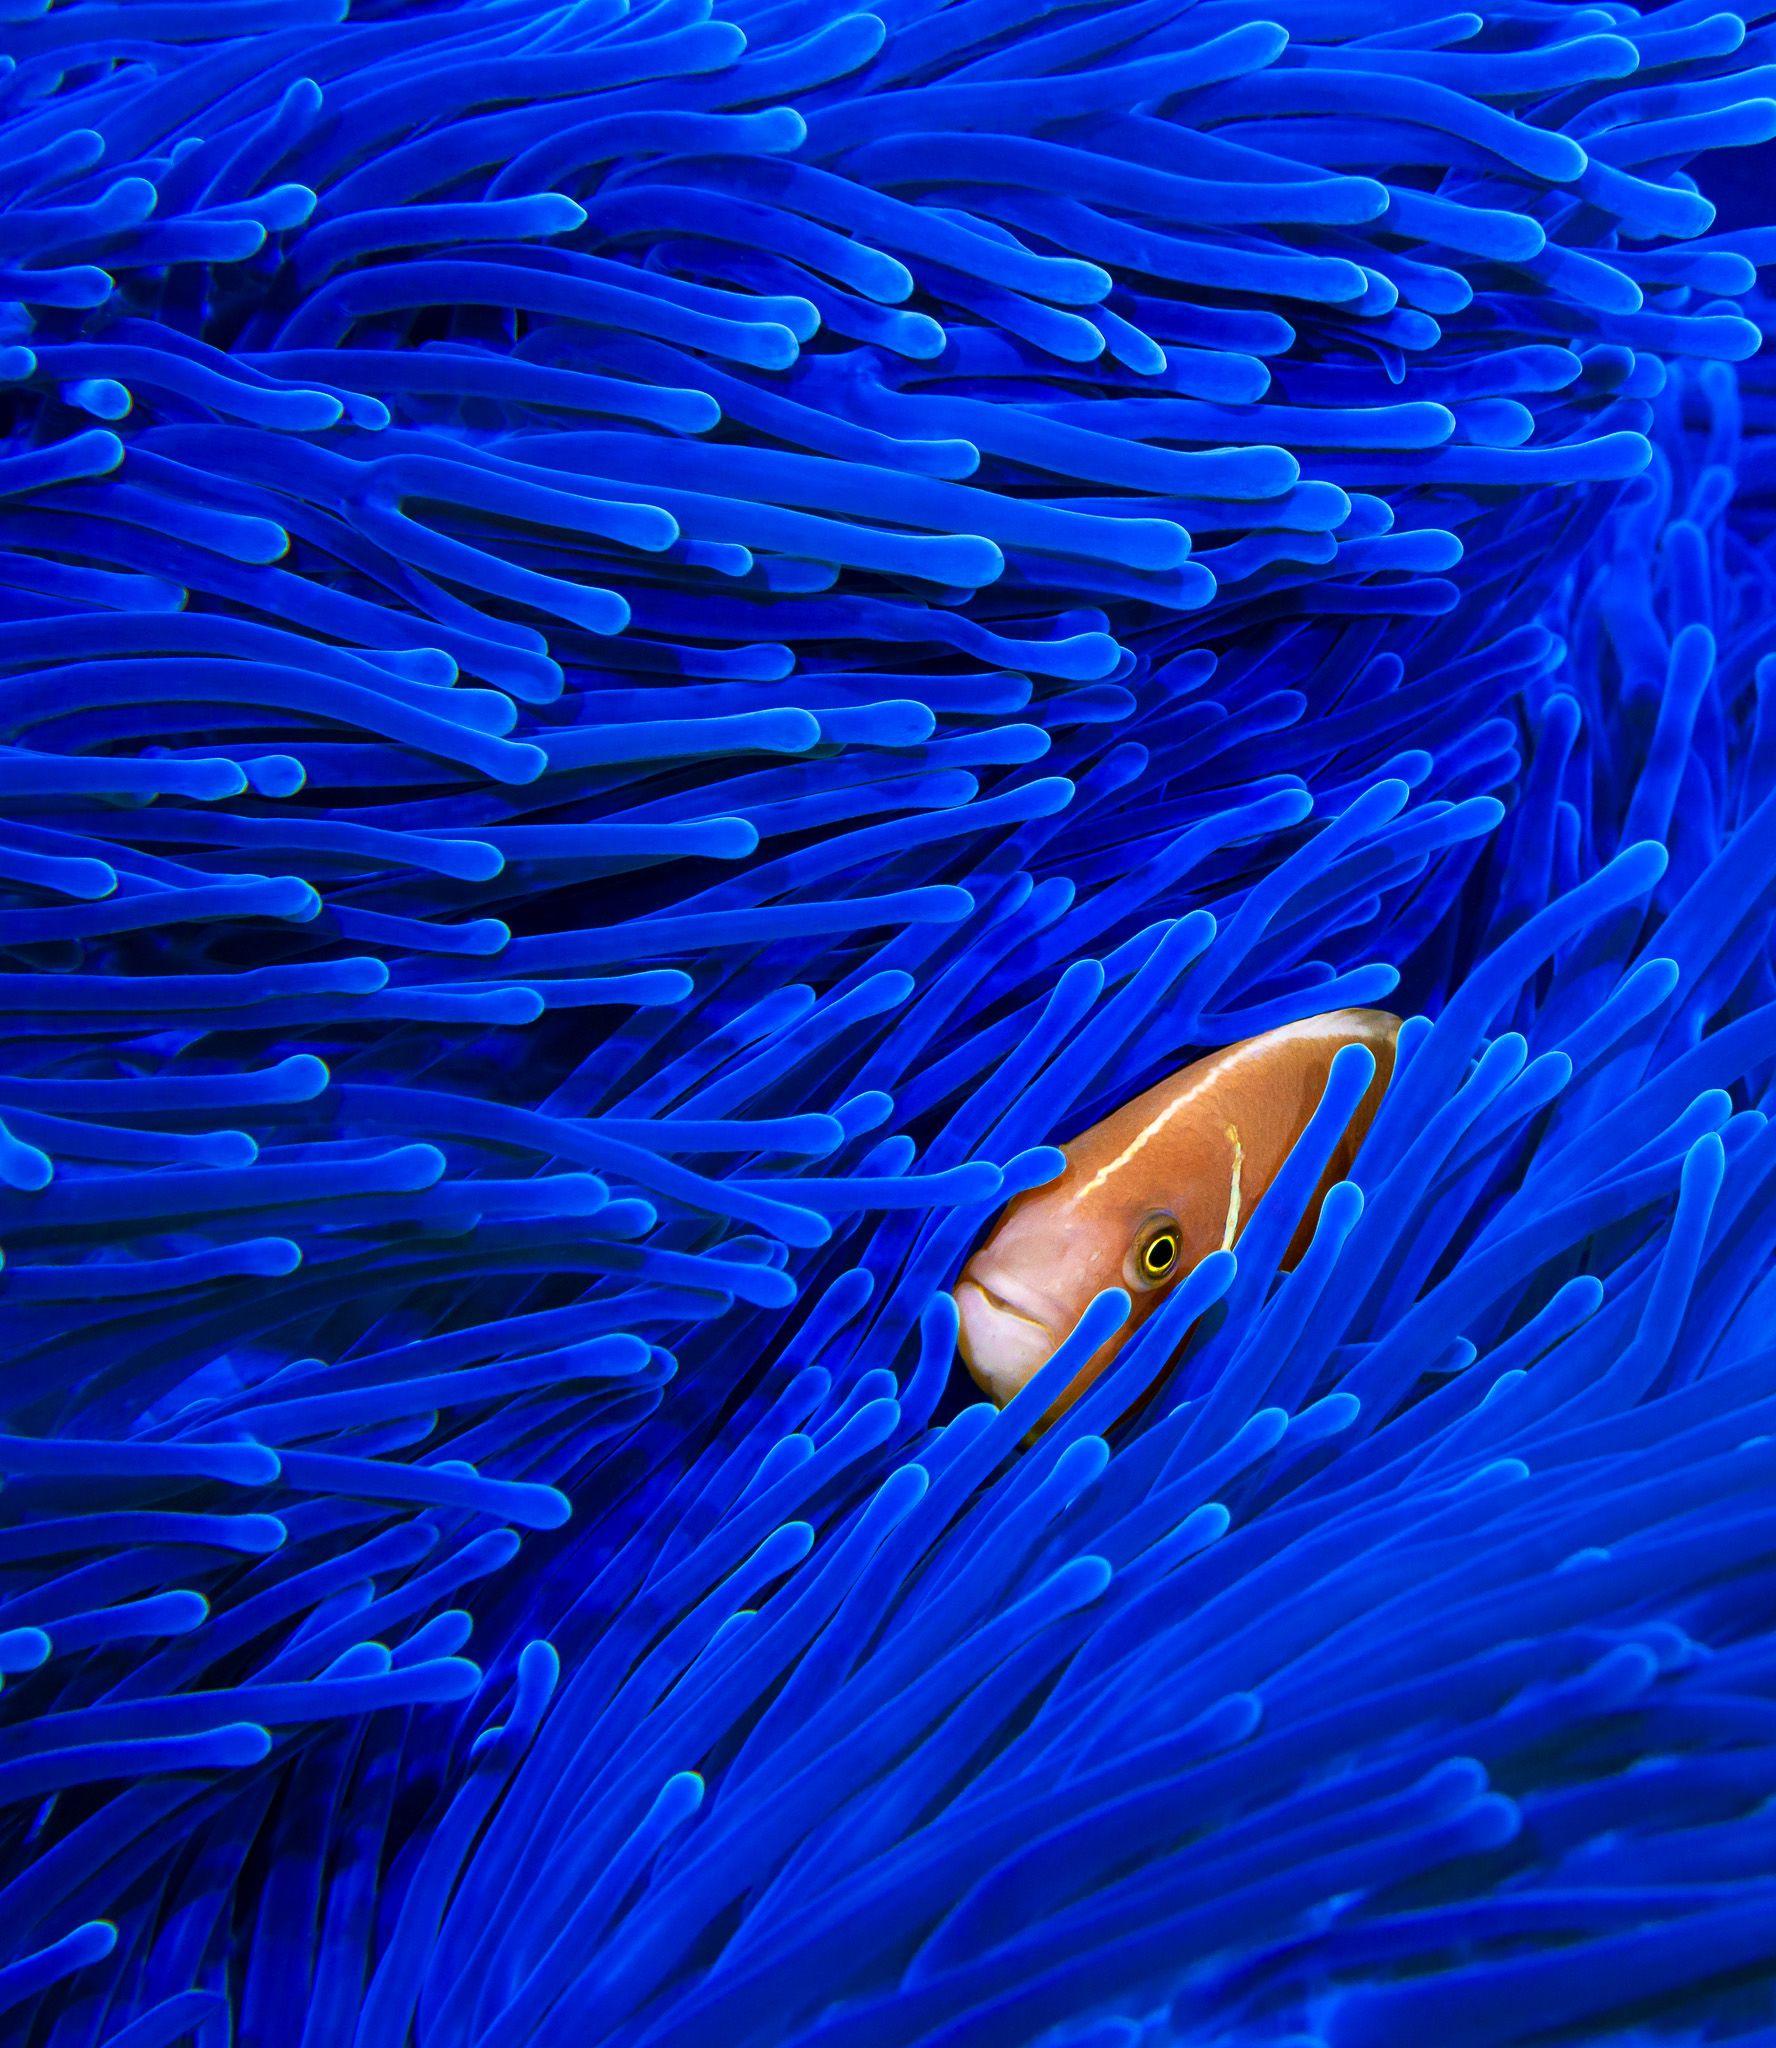 underwater, diving, scuba, ocean, sea, anemone, blue, pink, fish, tropical, macro, marine, Савин Андрей